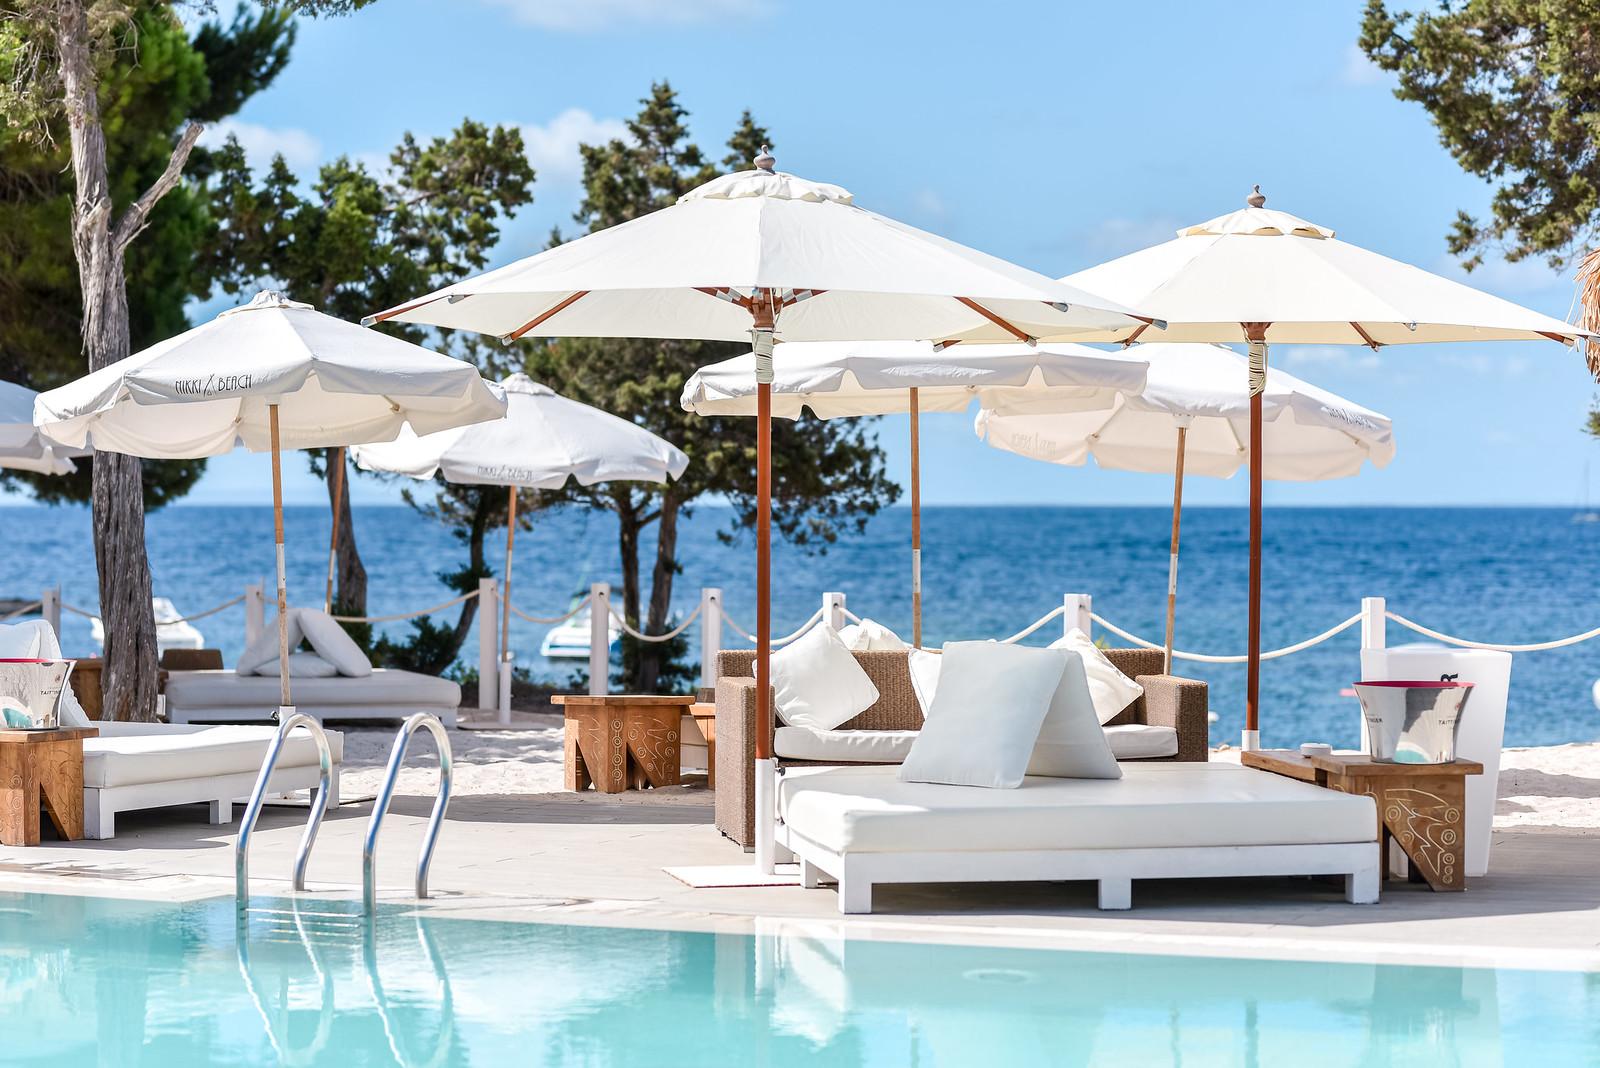 Barefoot luxury and beachside bliss